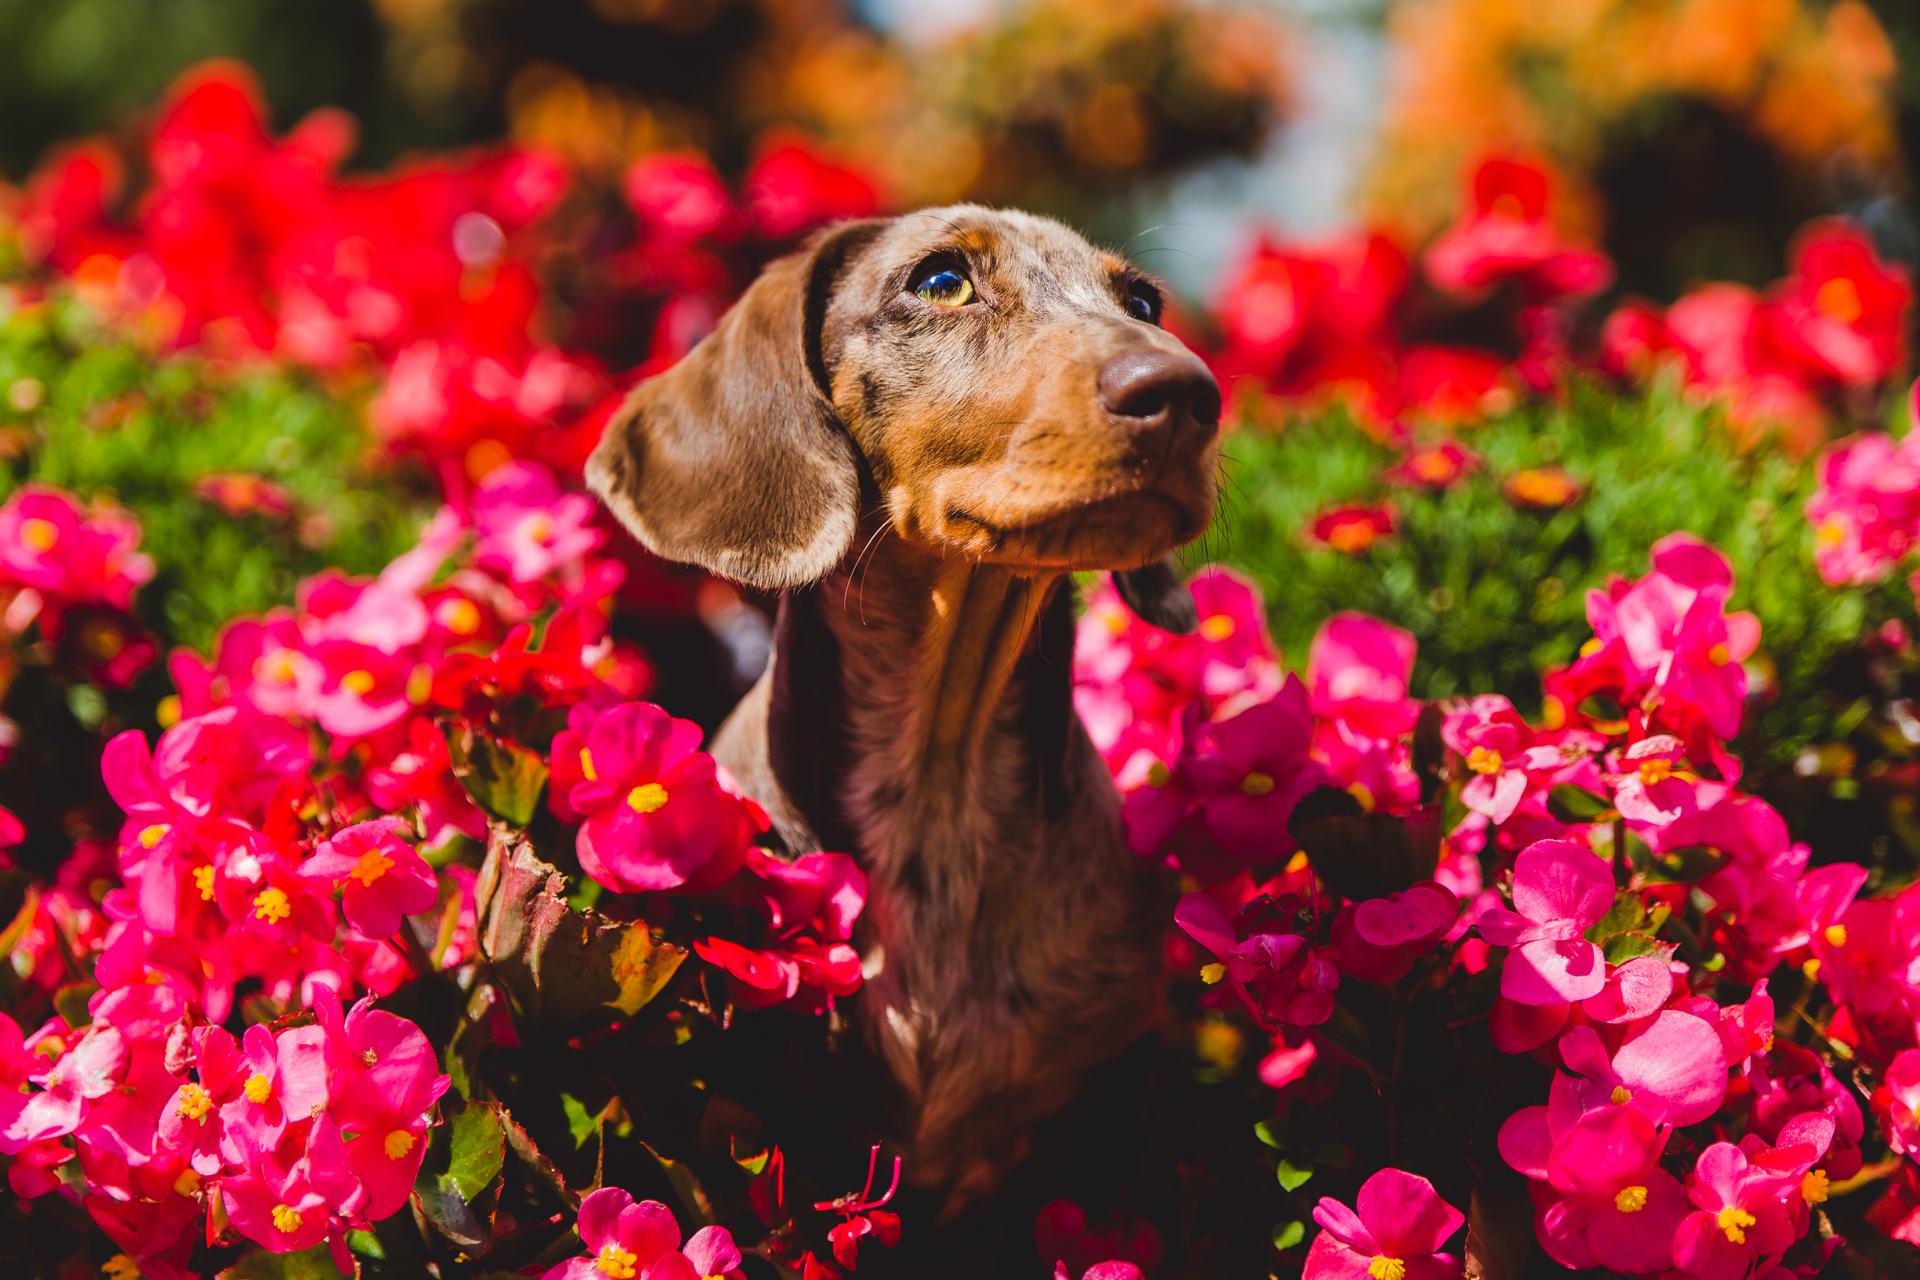 Miniature Dachshund in flowers